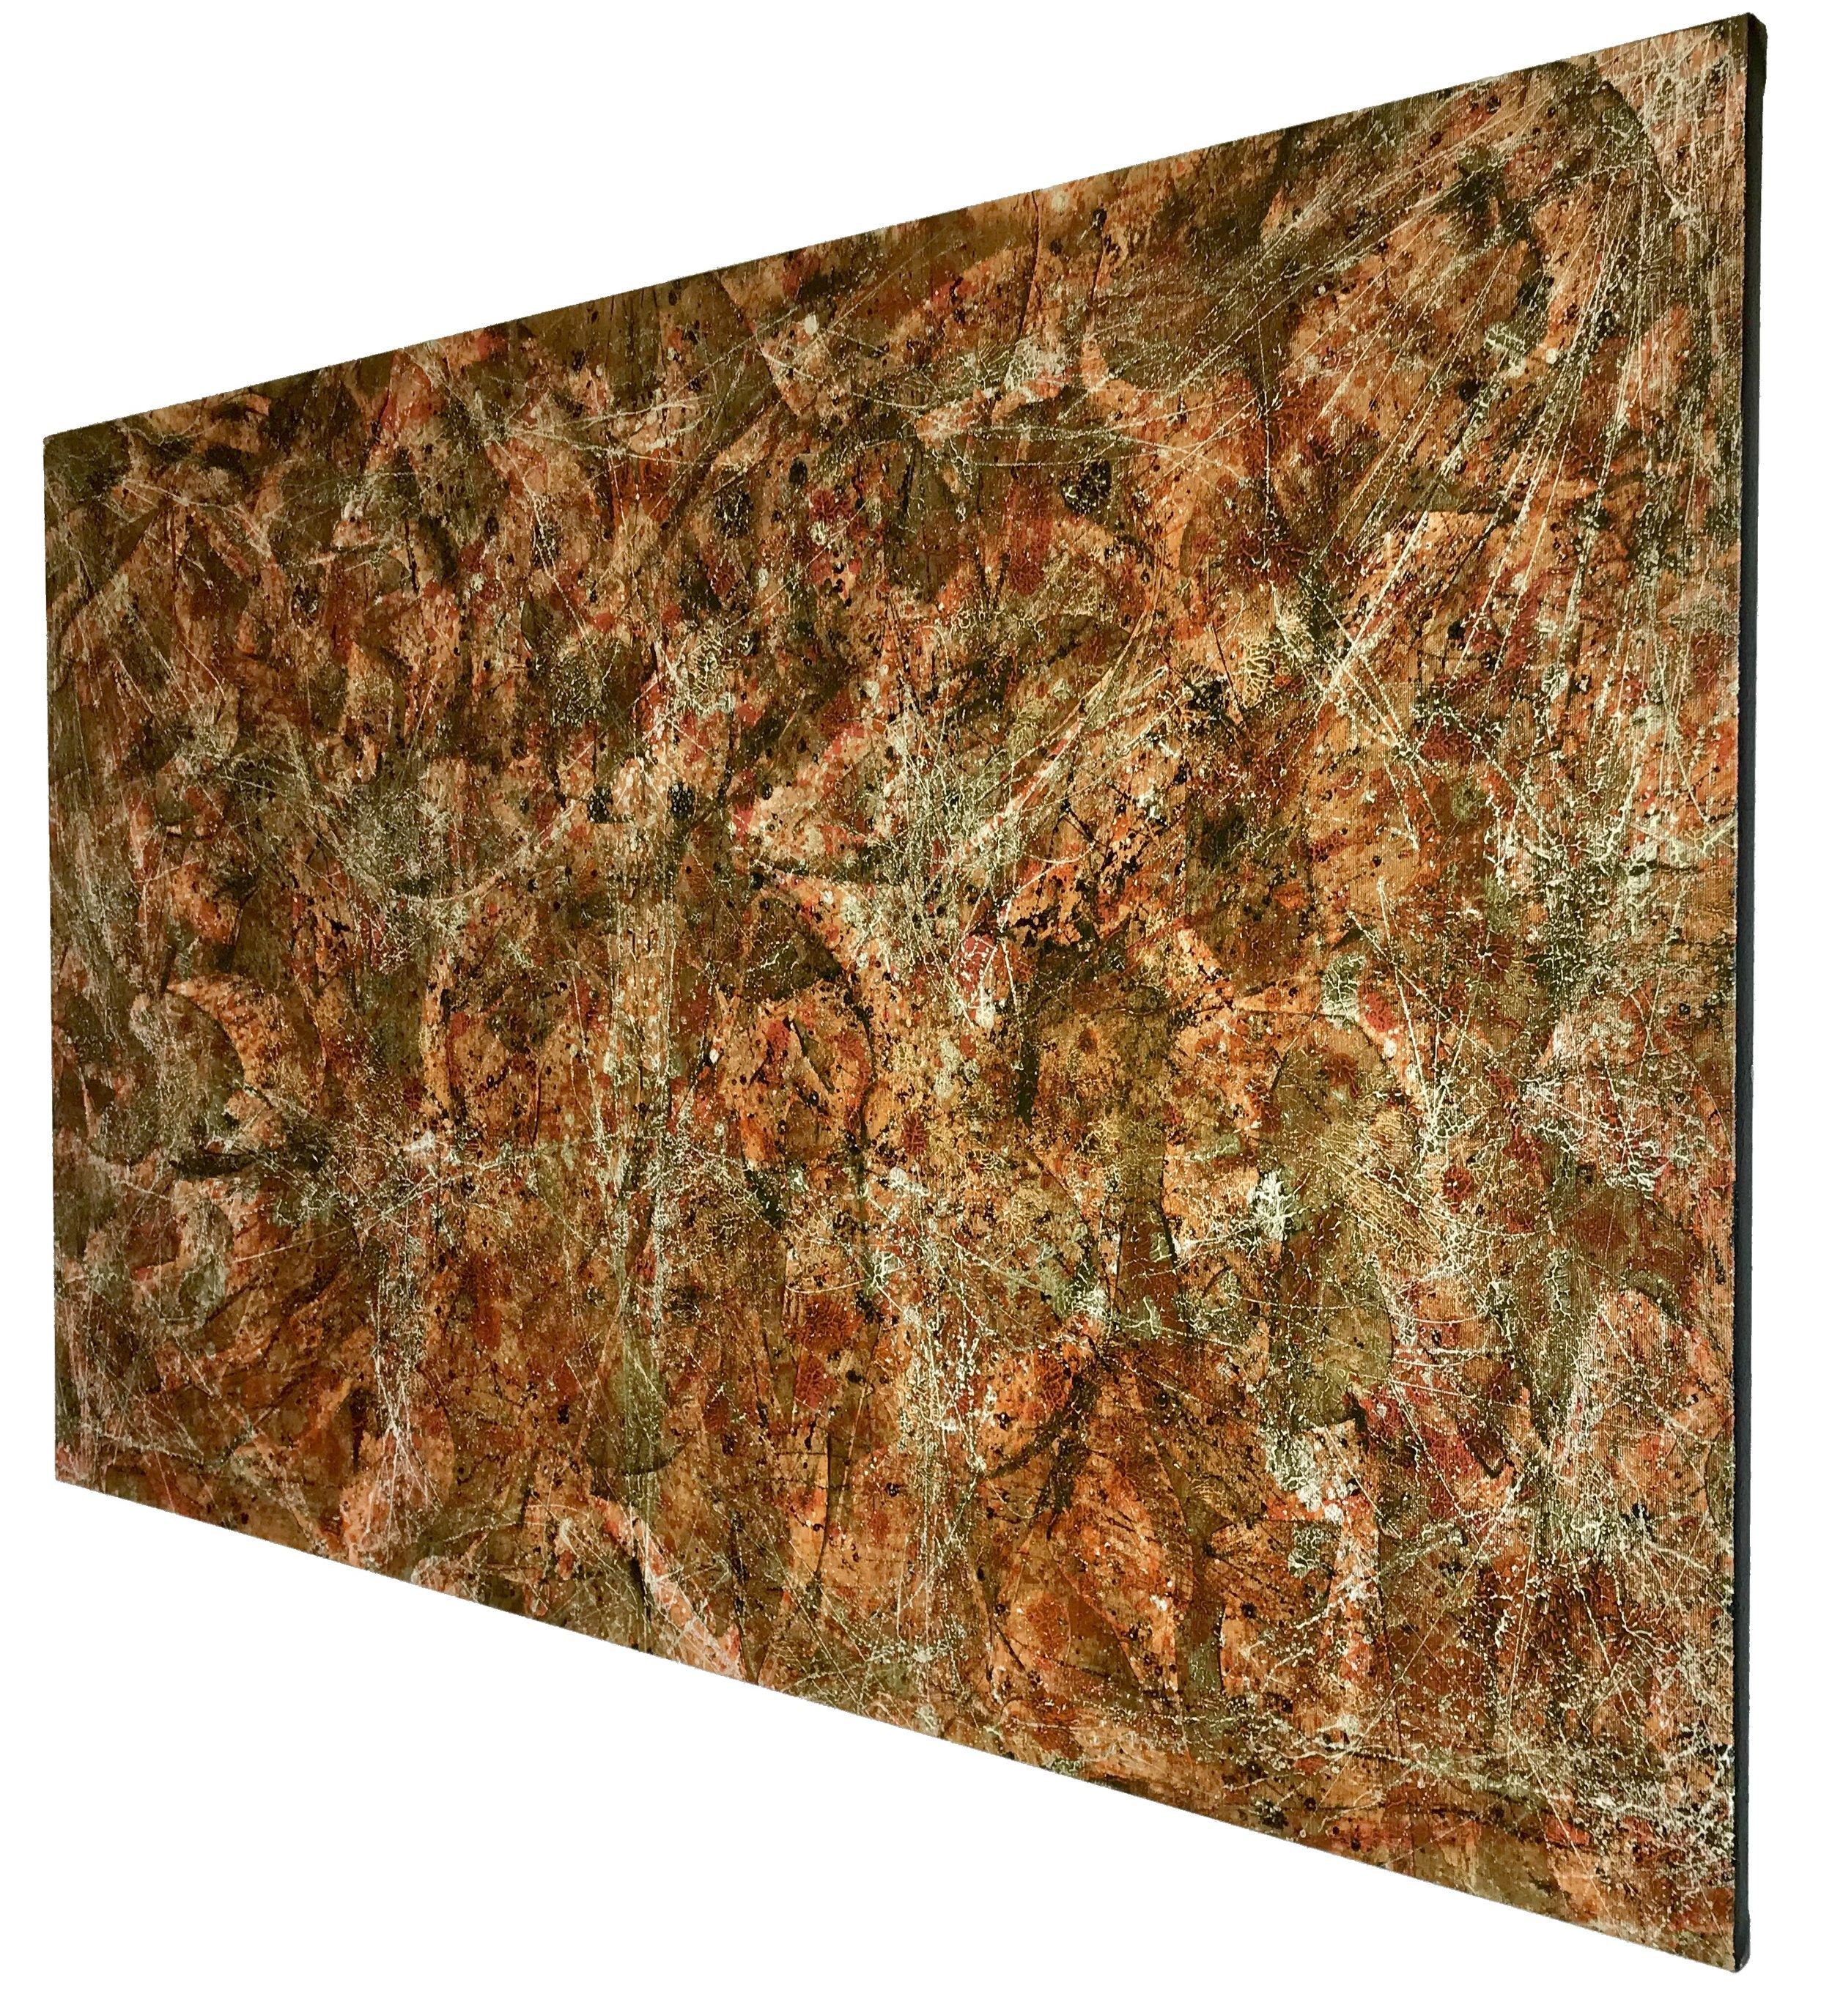 Fall Rorschach - Oil on Cotton Canvas75x180cm